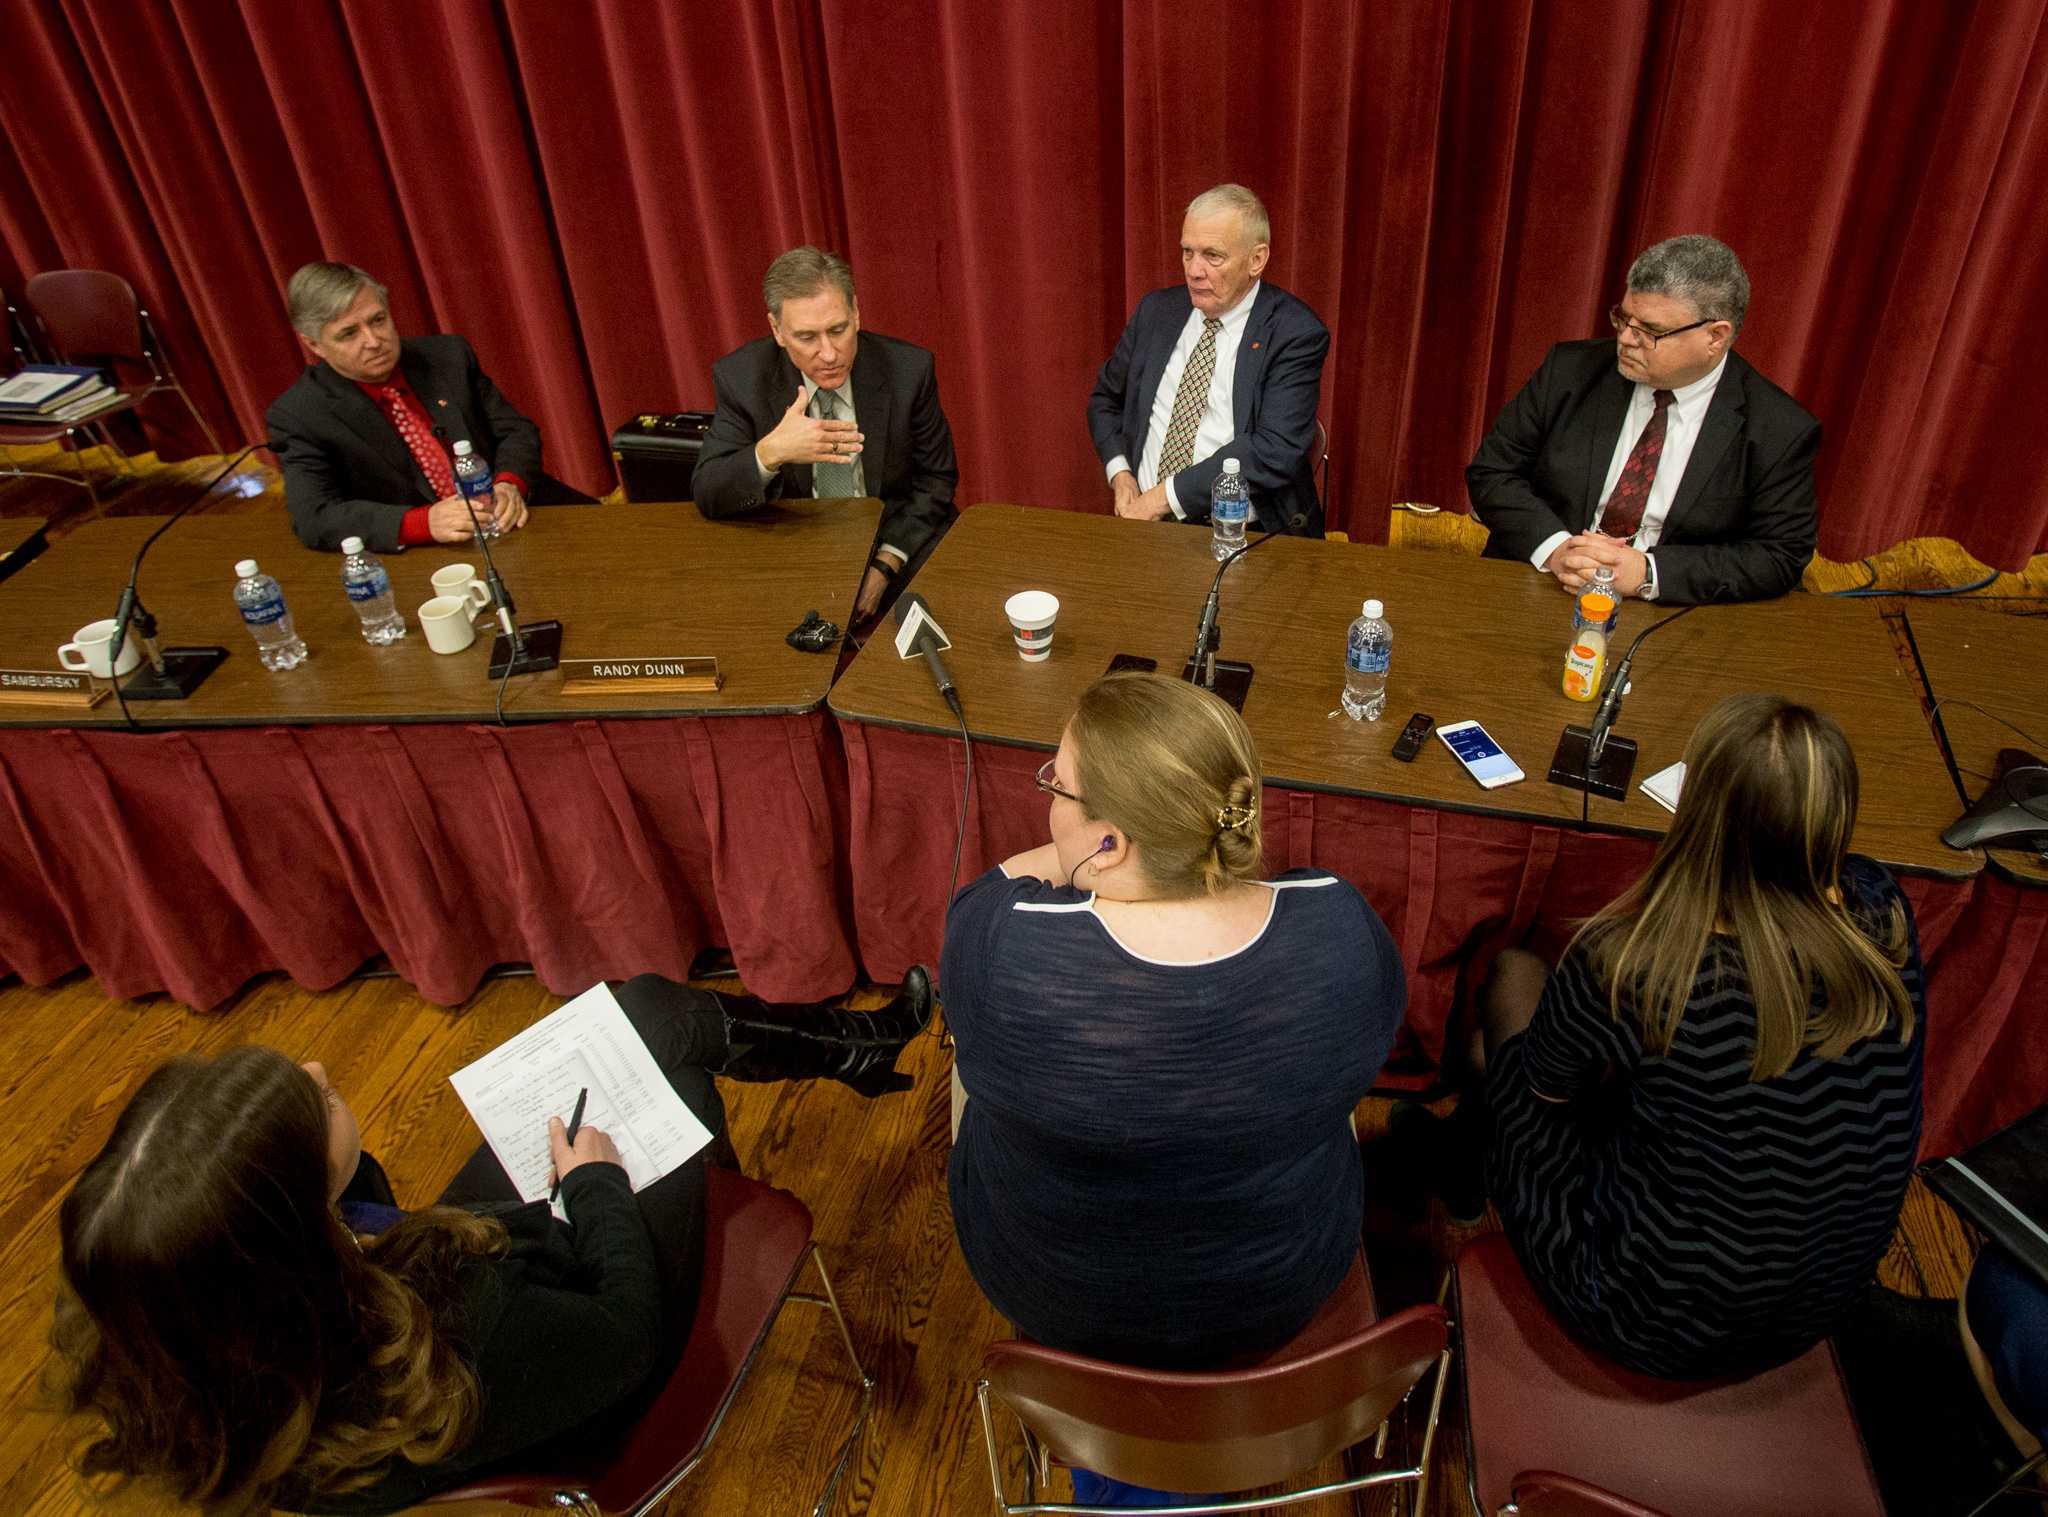 SIU administrators speak to press at the SIU Board of Trustees meeting Thursday, Feb. 9, 2017, in the Meridian Ballroom at SIUE. (Brian Munoz | @BrianMMunoz)